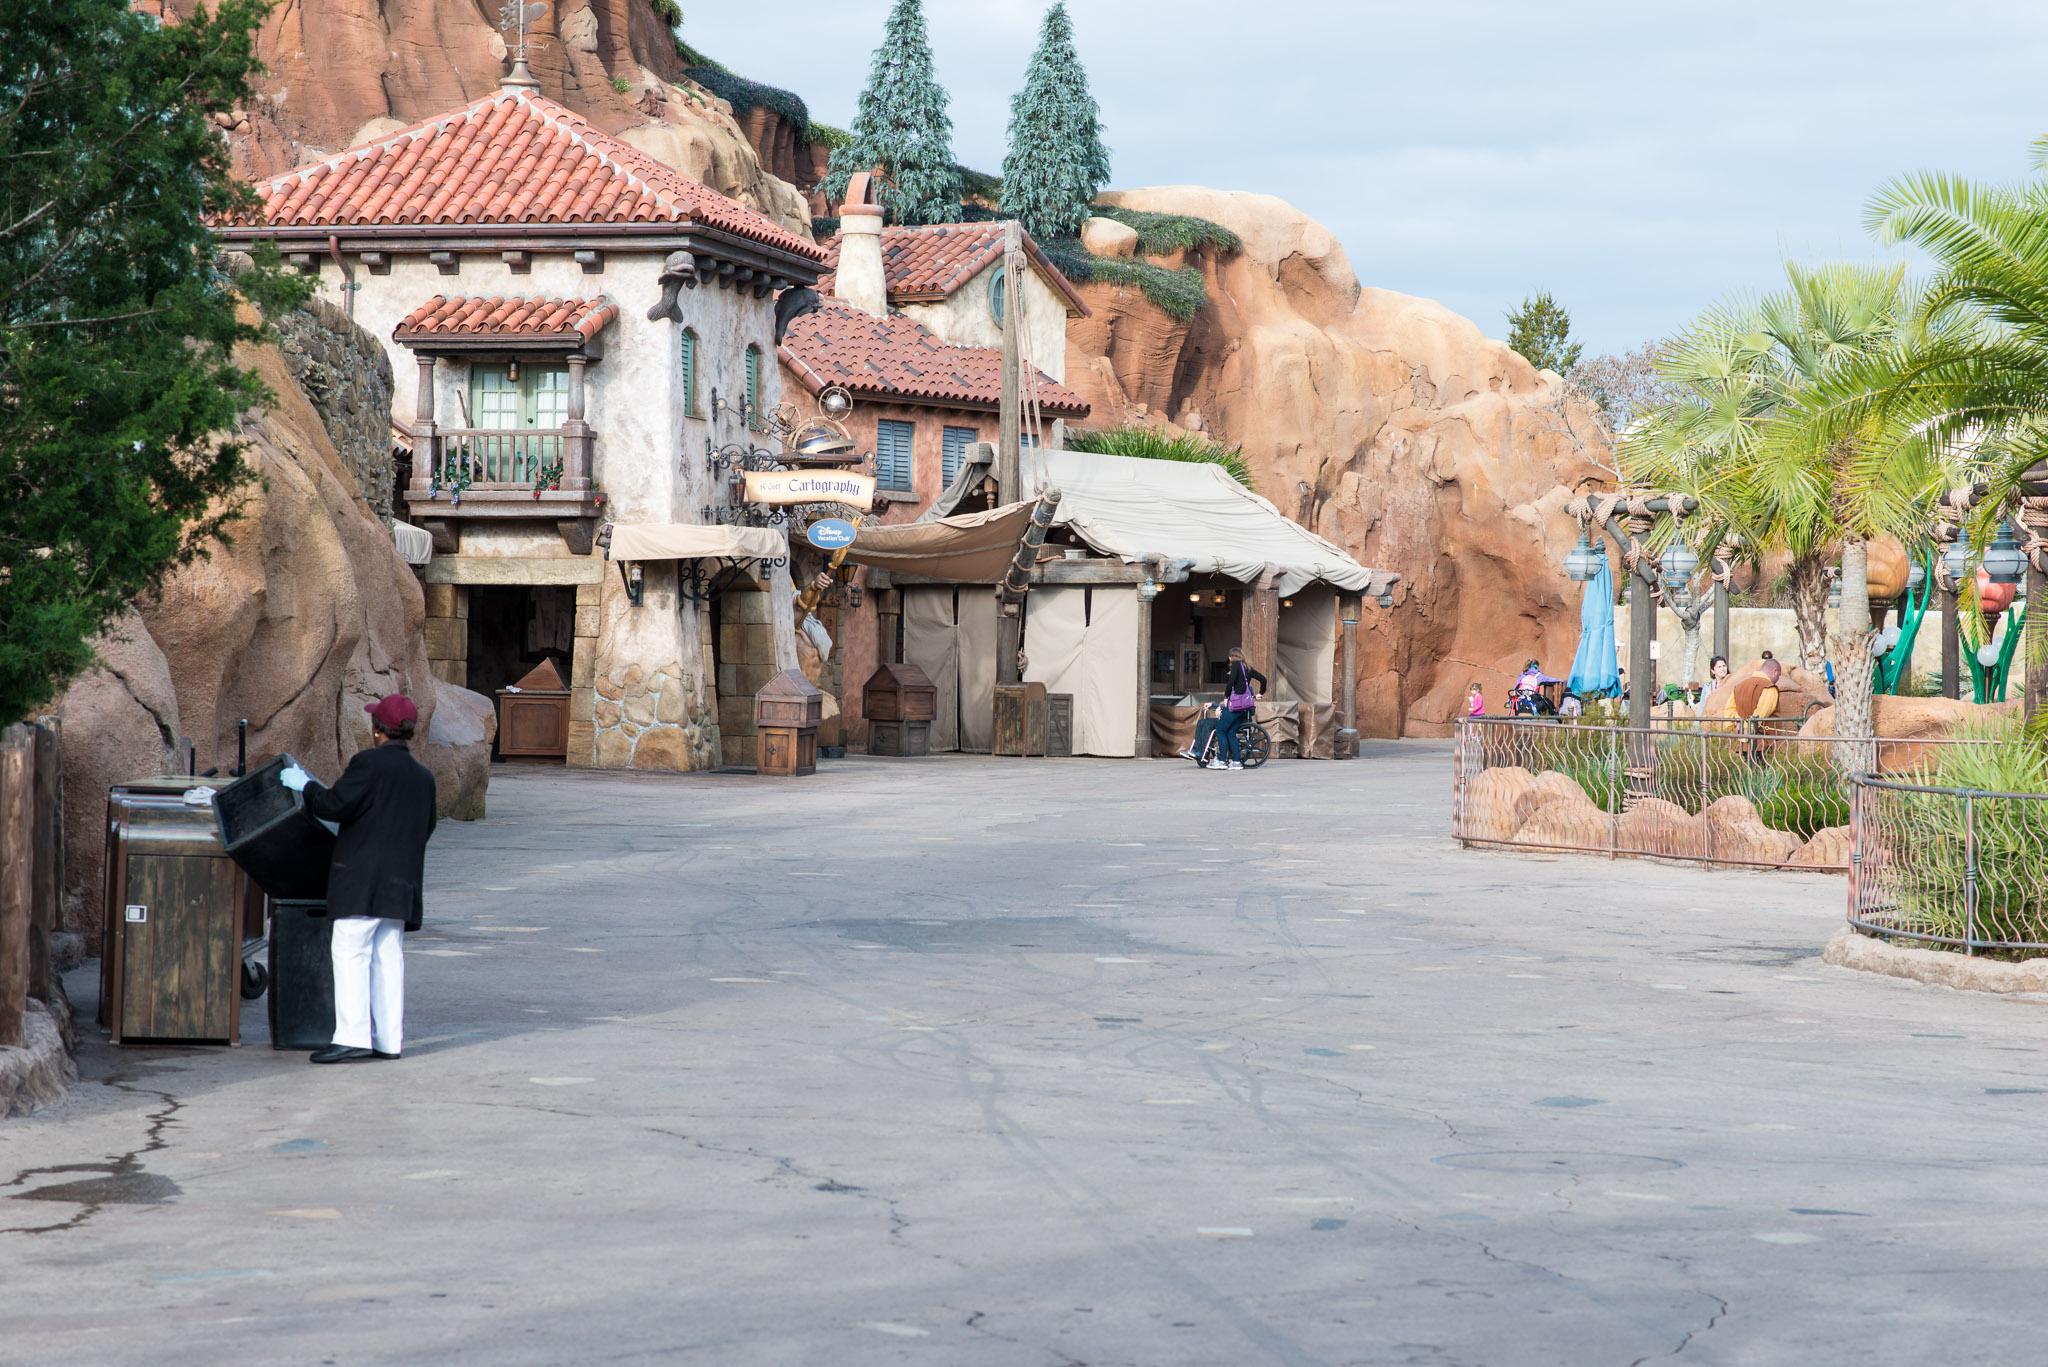 Little Mermaid No Crowds - Walt Disney World Magic Kingdom